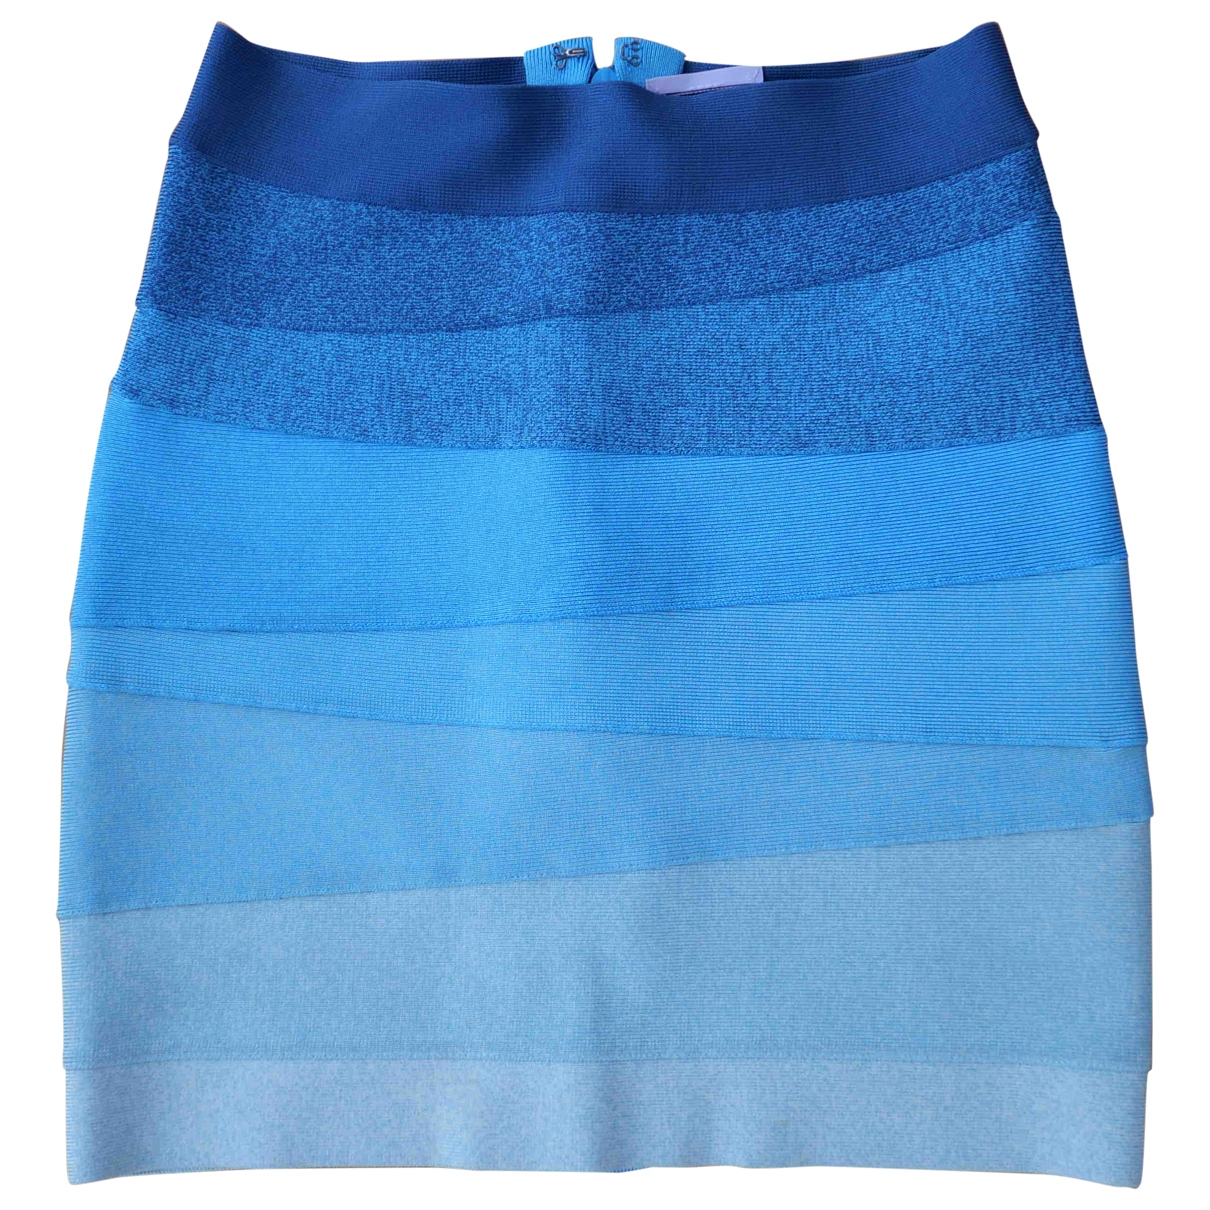 Herve Leger - Jupe   pour femme - bleu